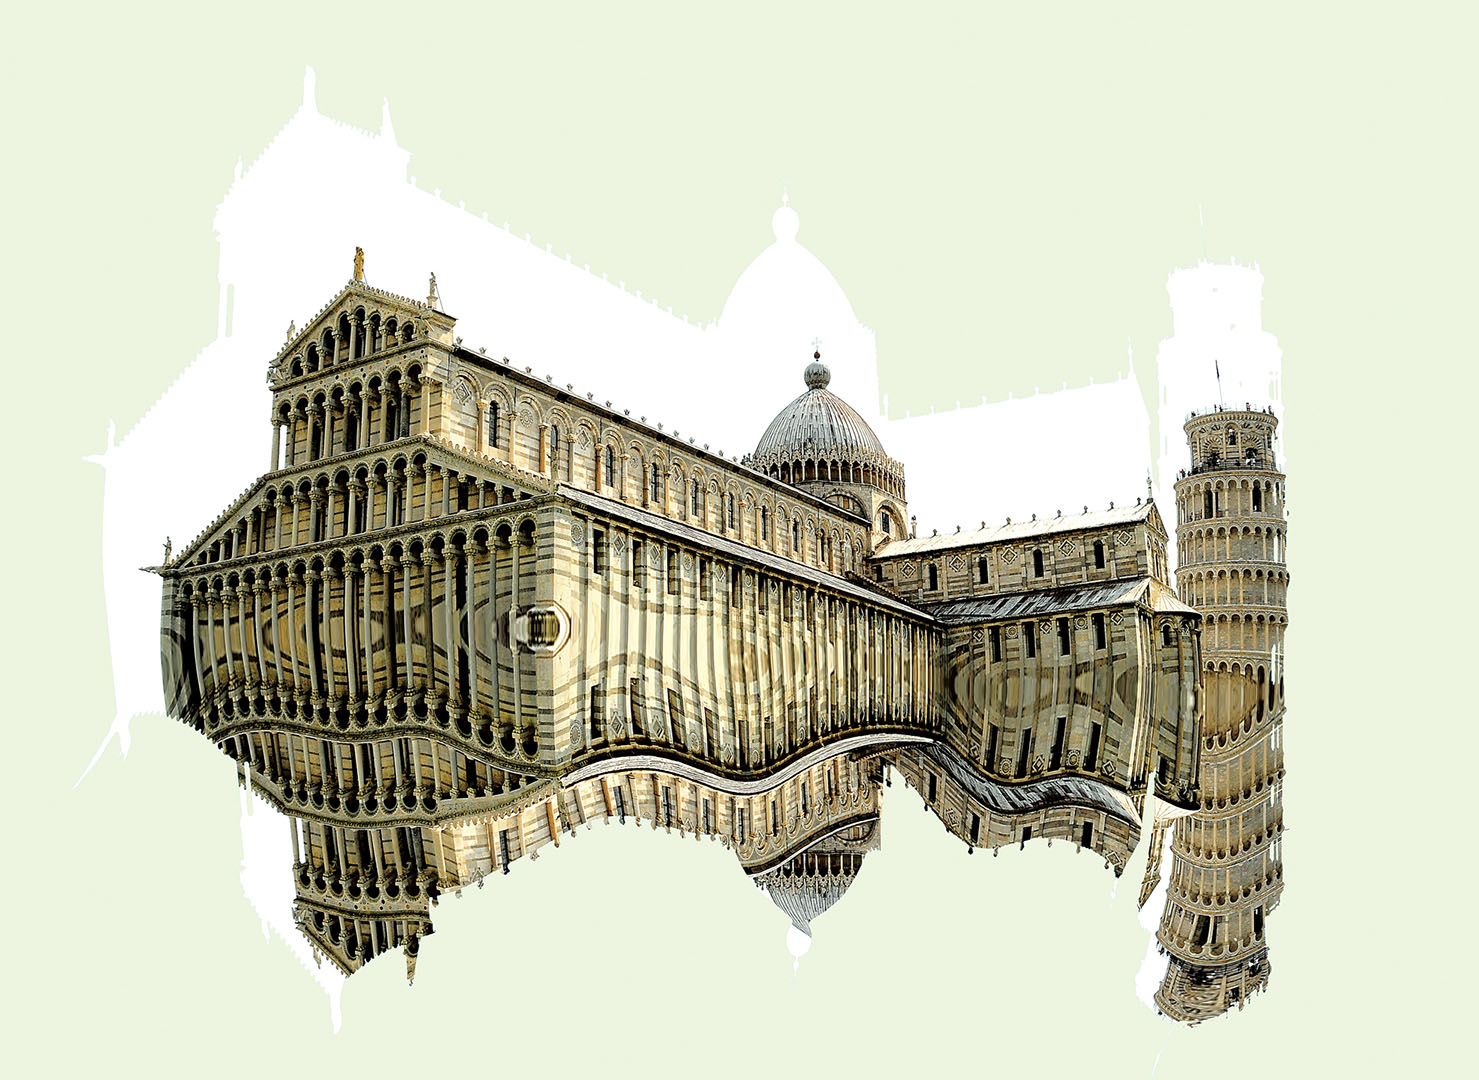 Pisa-Piazza_dei_Miracoli_025_I11.1-55